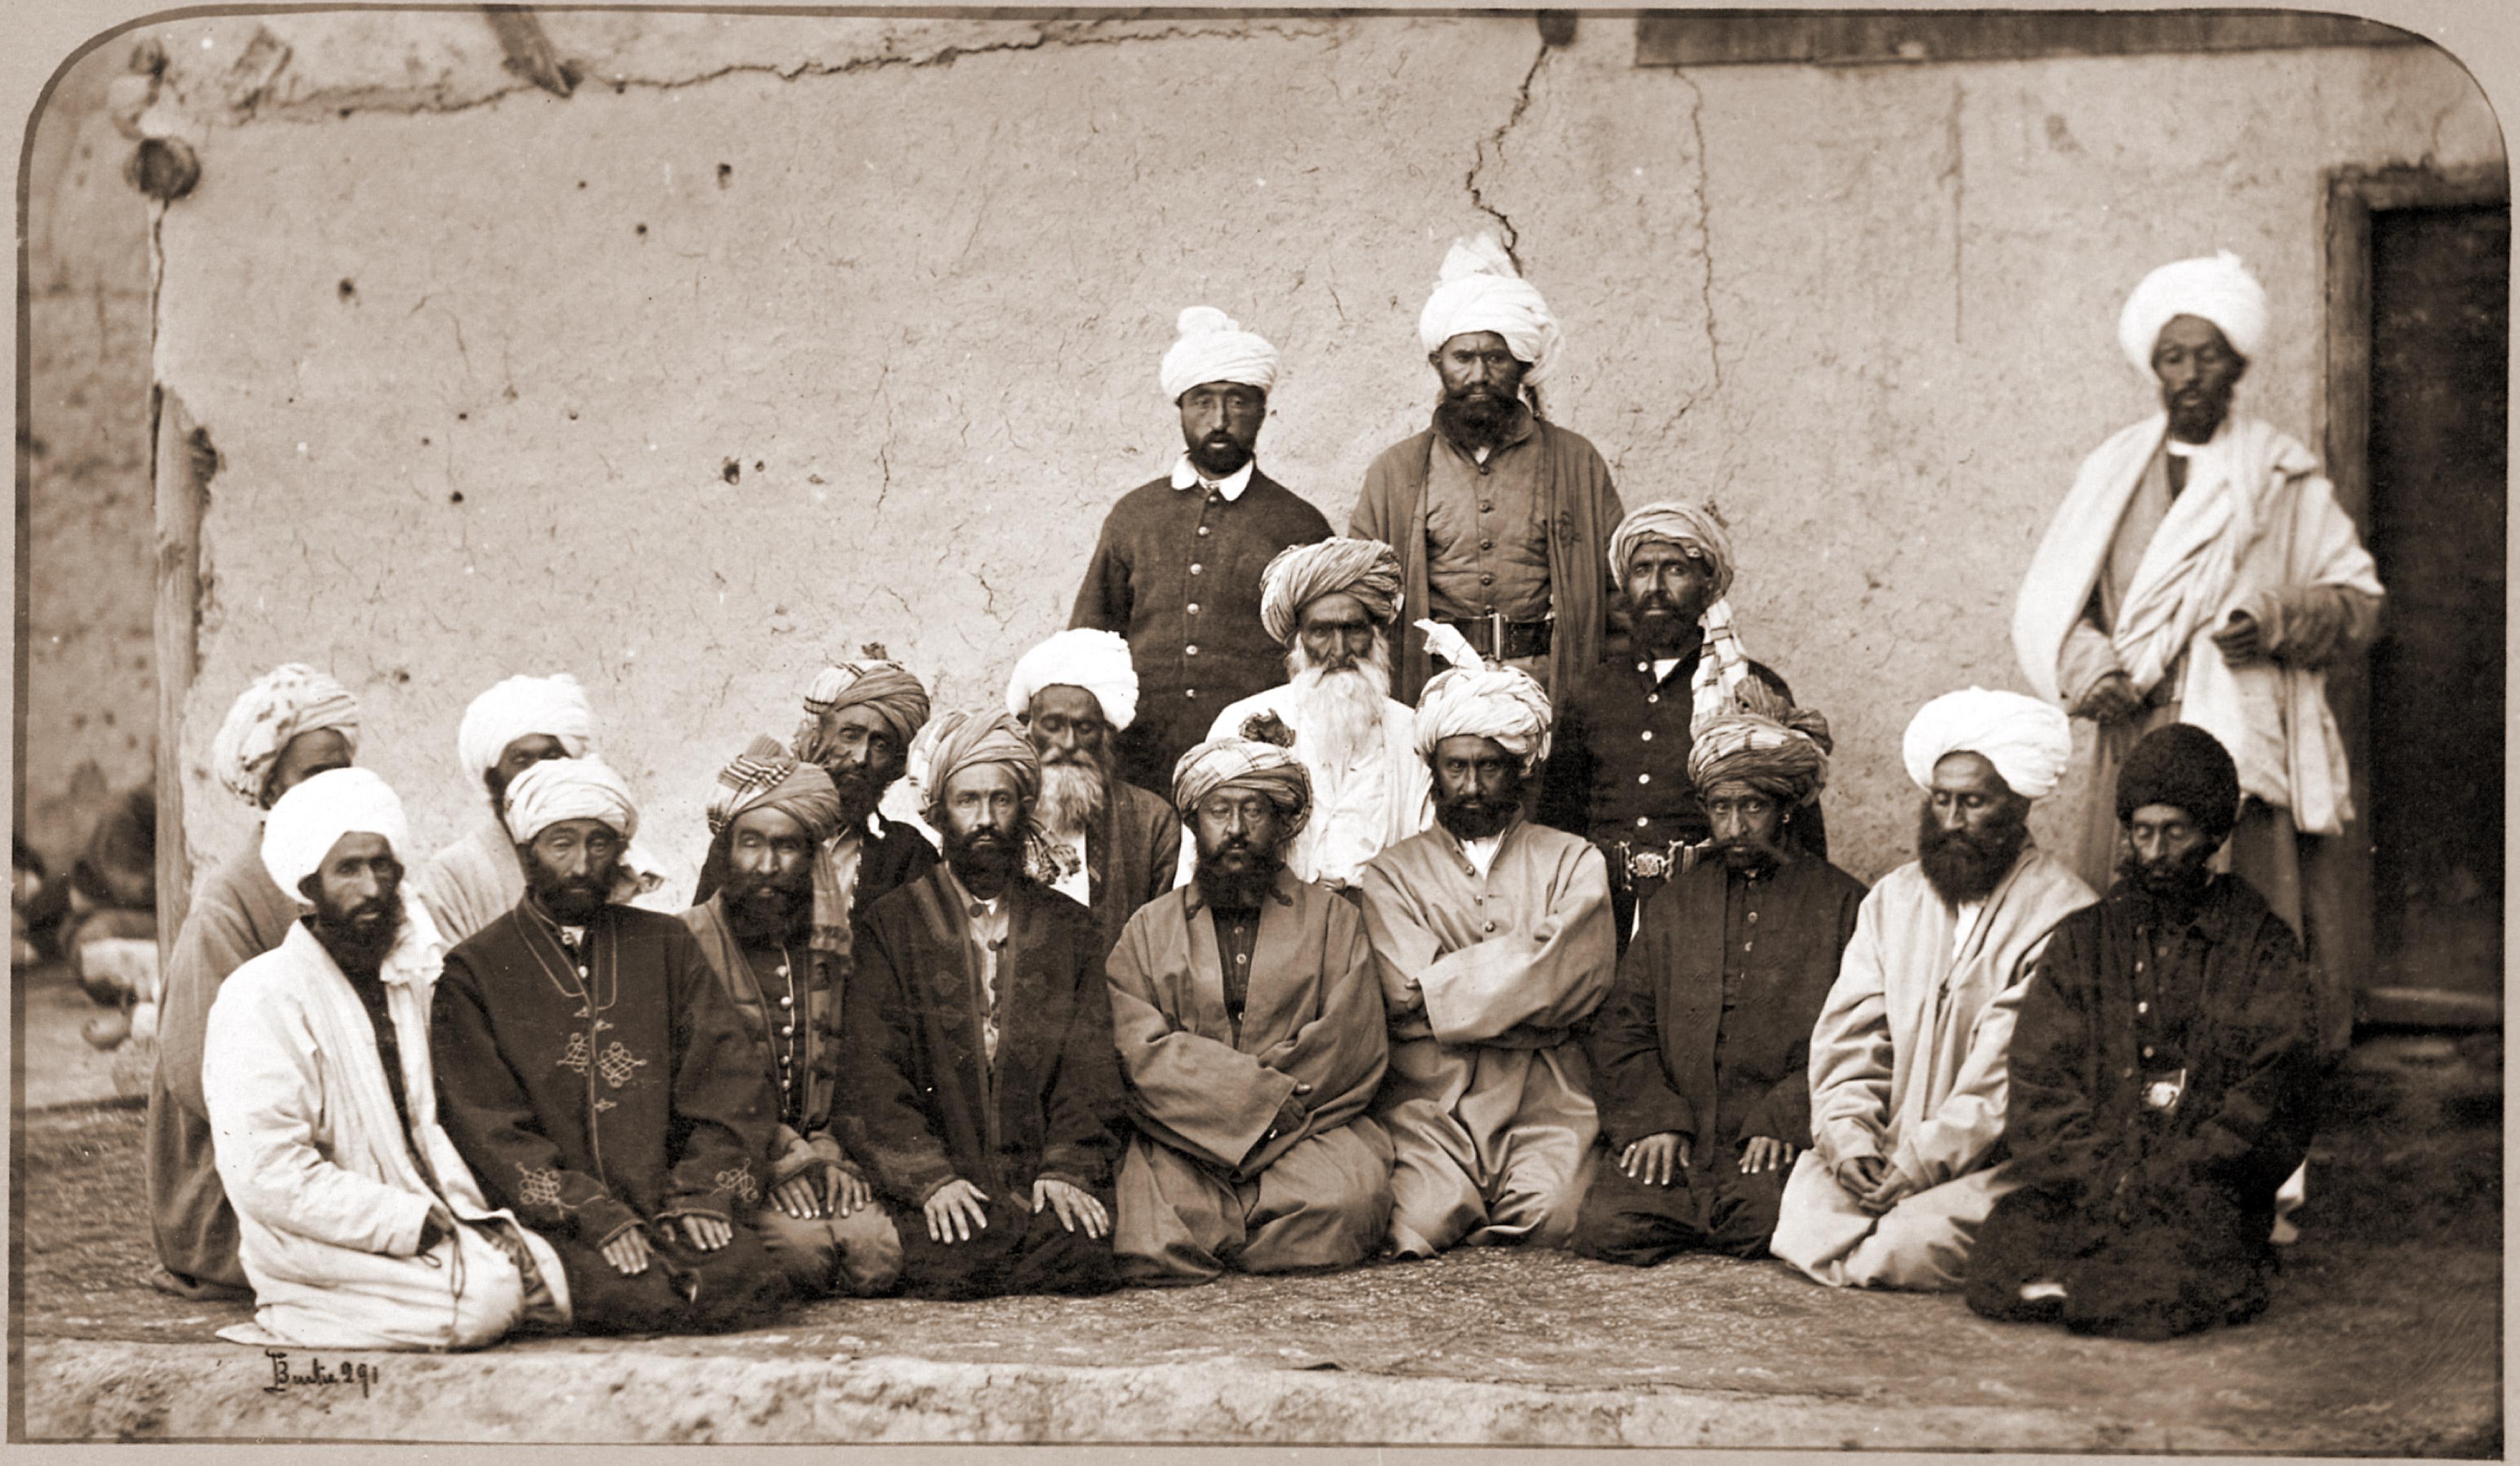 Fichier:Sirdar Habibullah Gilzai and other Khans in 1879-80.jpg